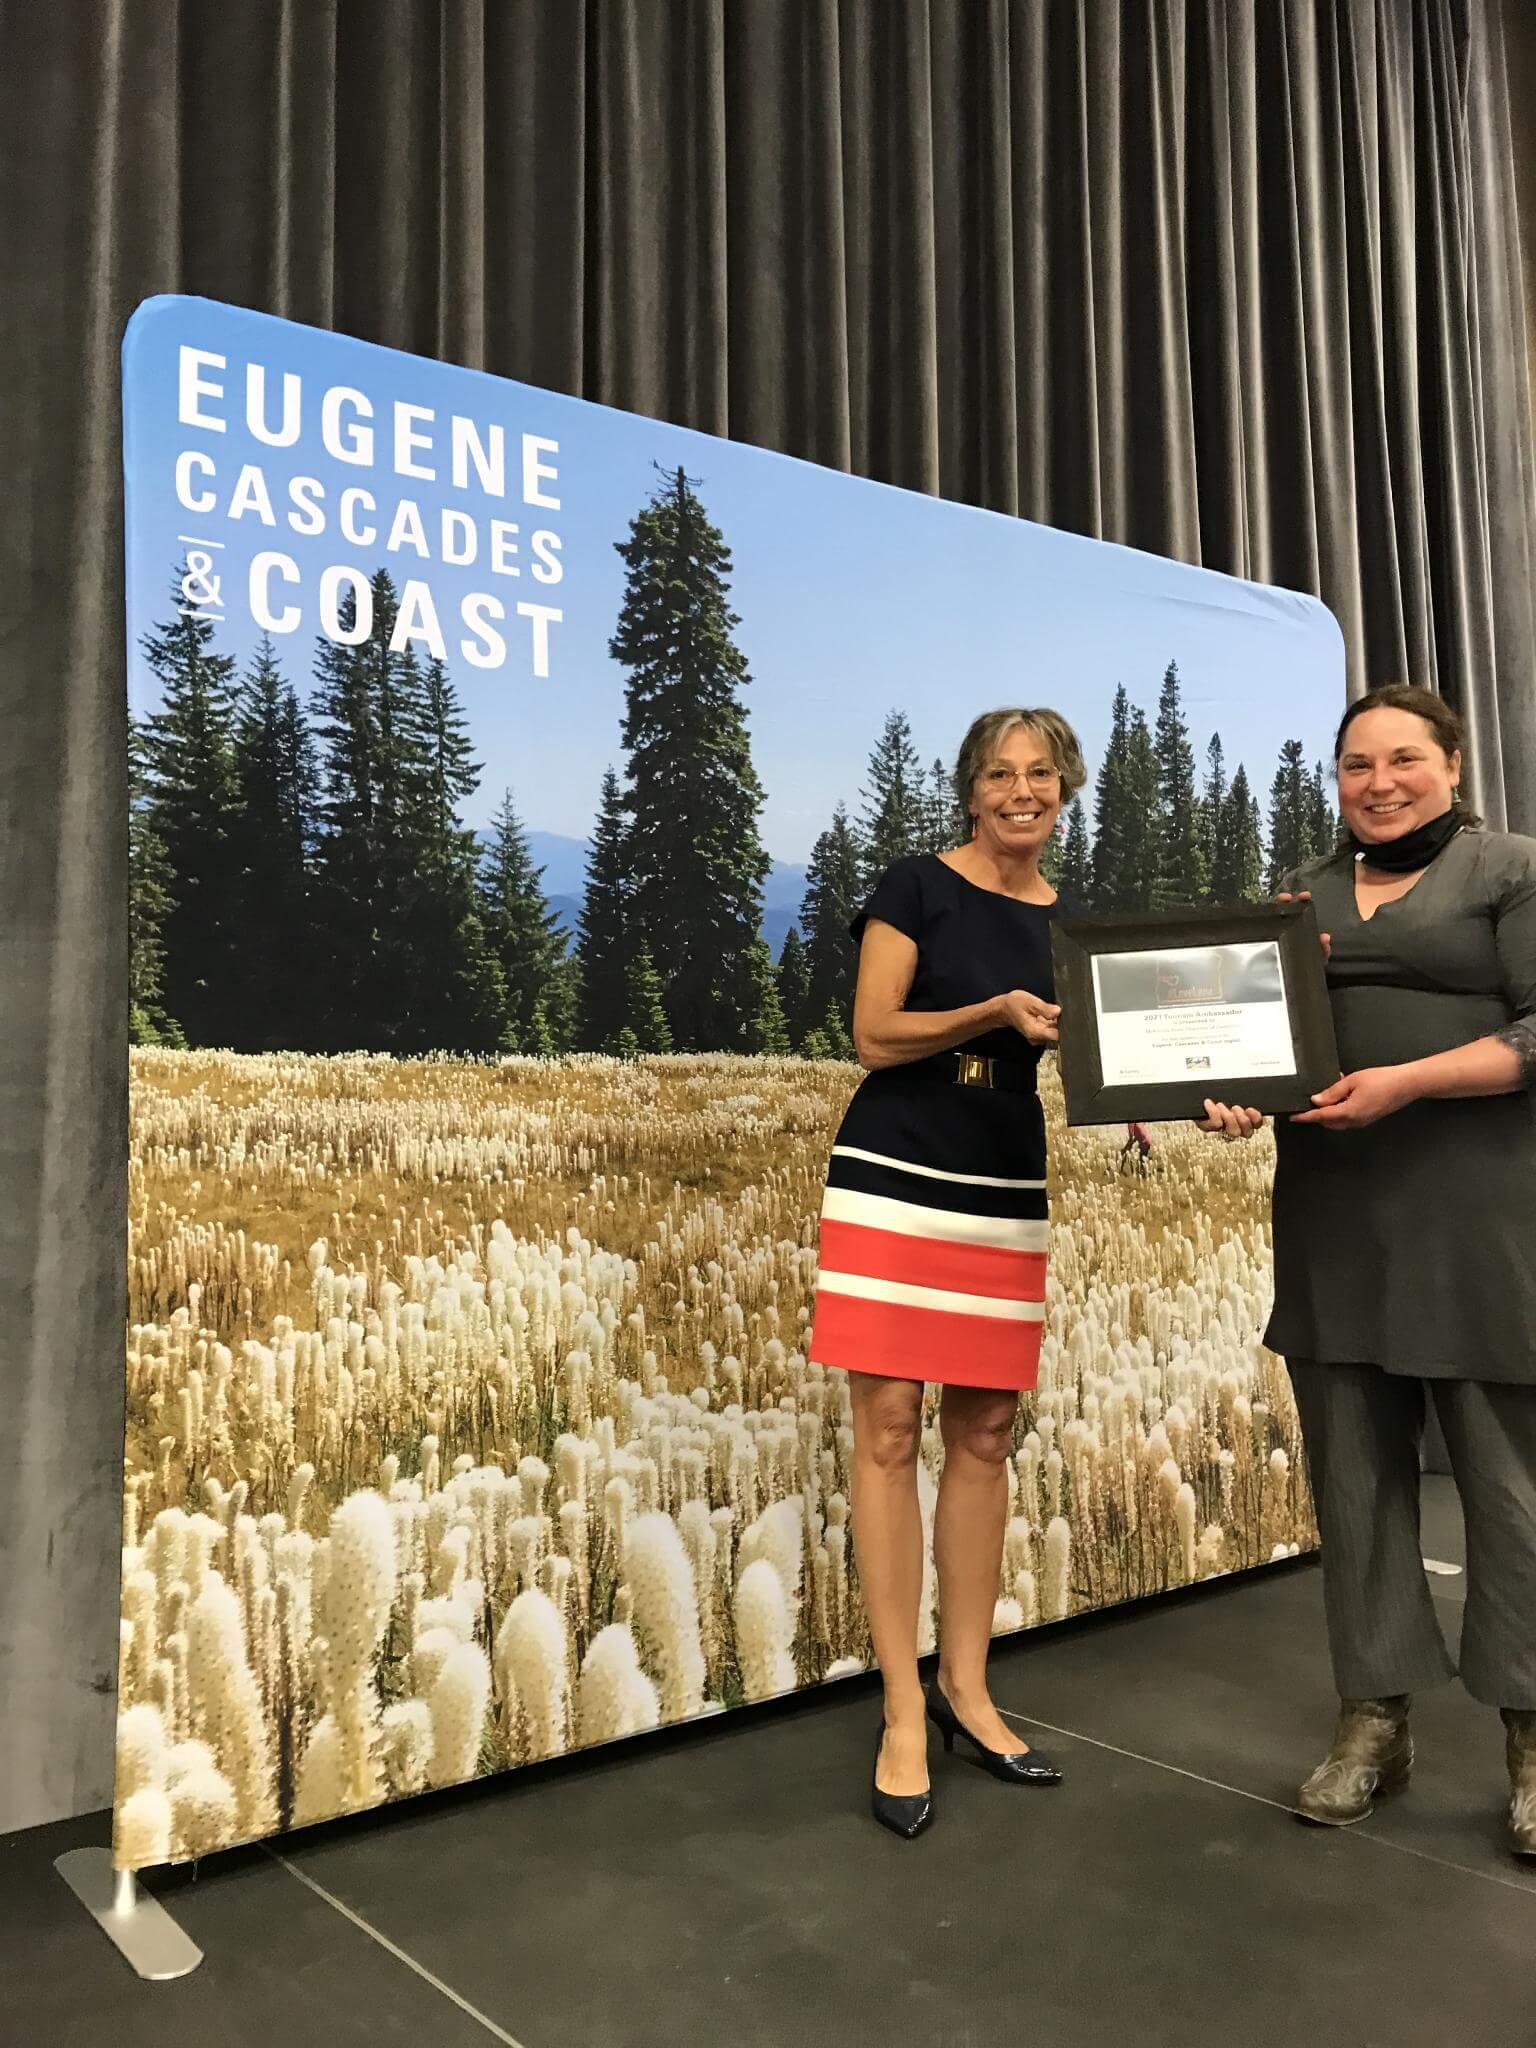 Executive Director Alice Bonasio, collects the Tourism Ambassador award on behalf of the McKenzie River Chamber of Commerce. Photo credit: Natalie Inouye